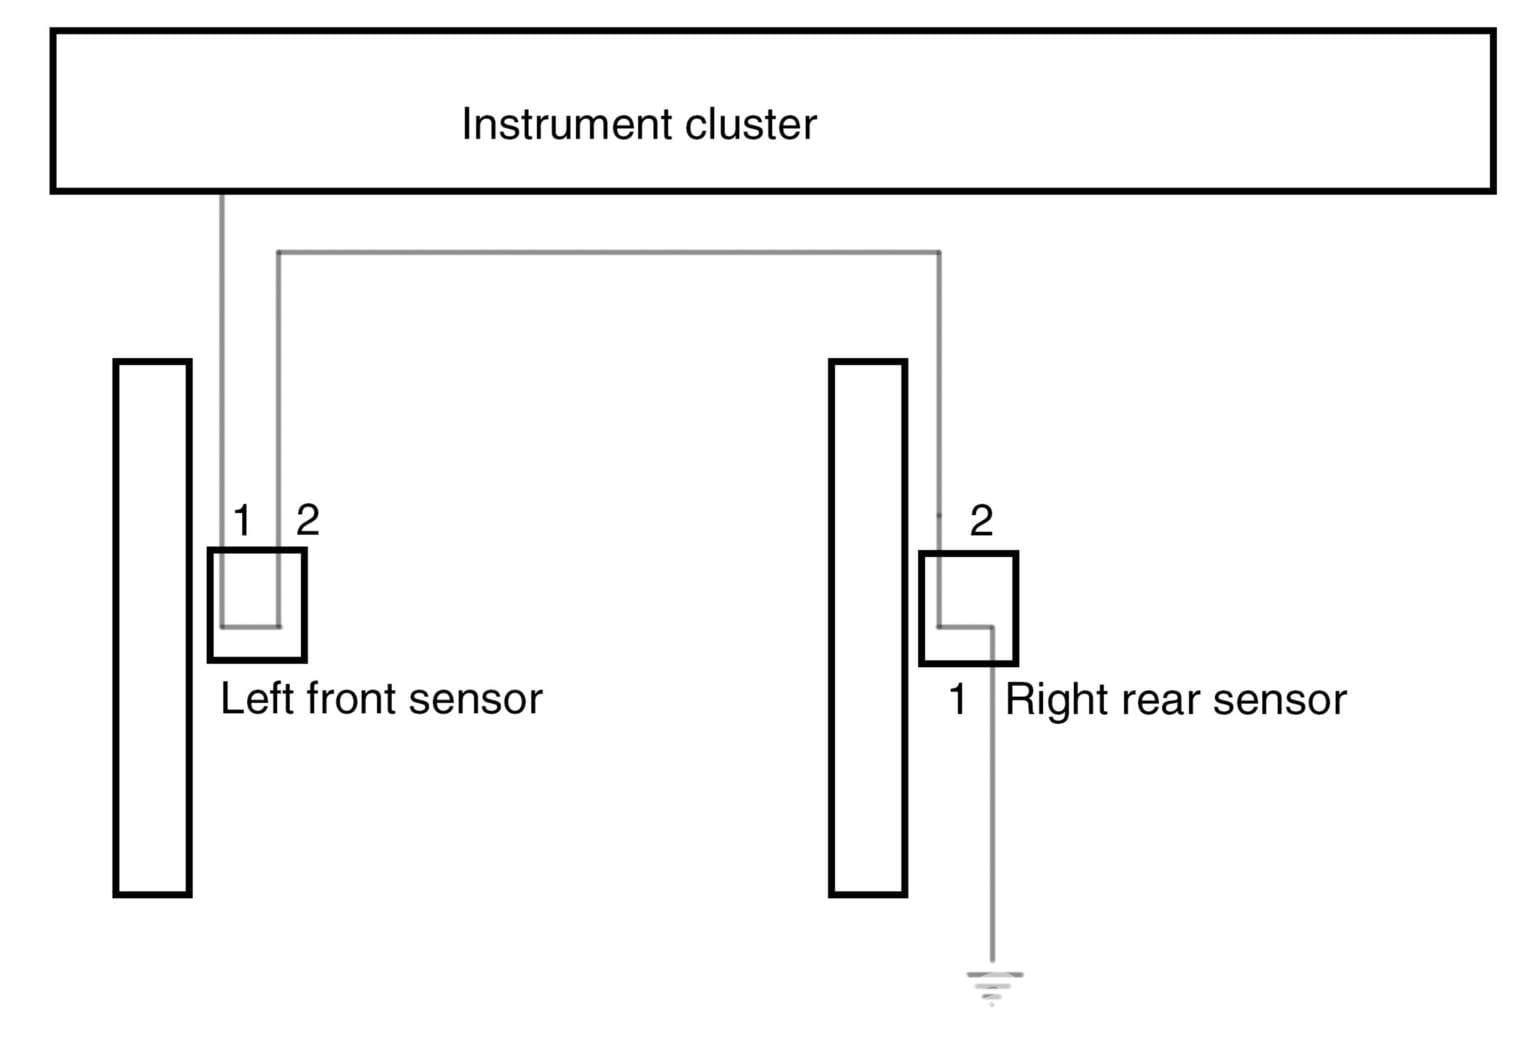 Bmw ke Sensor Wiring Diagram isuzu trooper wiring diagram ... Isuzu Trooper Dashboard Wiring Diagram on chrysler pacifica wiring-diagram, honda cr-v wiring-diagram, land rover discovery wiring-diagram, bmw z4 wiring-diagram, ford f750 wiring-diagram, alfa romeo spider wiring-diagram, bmw x3 wiring-diagram, pontiac bonneville wiring-diagram, acura tl wiring-diagram, 2004 isuzu rodeo wiring-diagram, isuzu axiom wiring-diagram, chevrolet colorado wiring-diagram, subaru legacy wiring-diagram, 2001 isuzu npr wiring-diagram, range rover wiring-diagram, buick regal wiring-diagram, honda prelude wiring-diagram, subaru outback wiring-diagram, chevrolet trailblazer wiring-diagram,